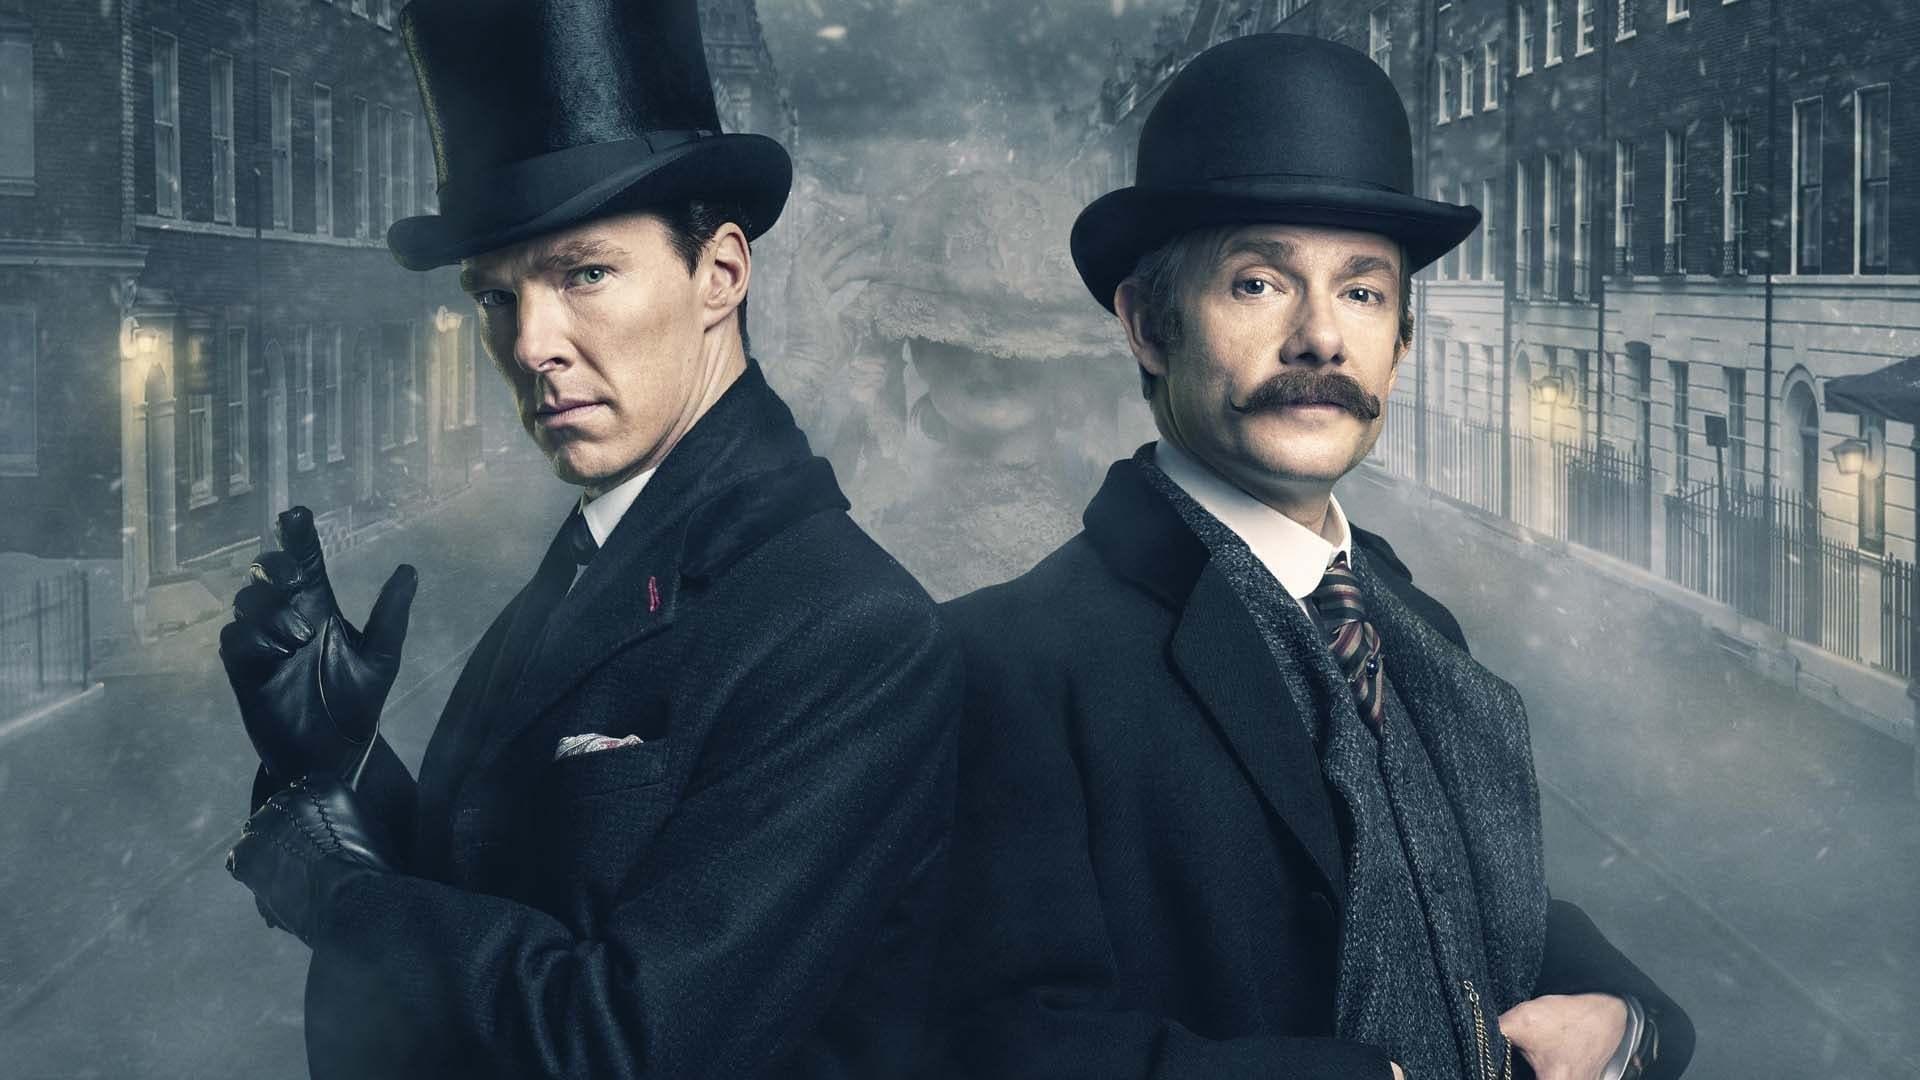 Кадры из фильма Шерлок Sherlock 2010